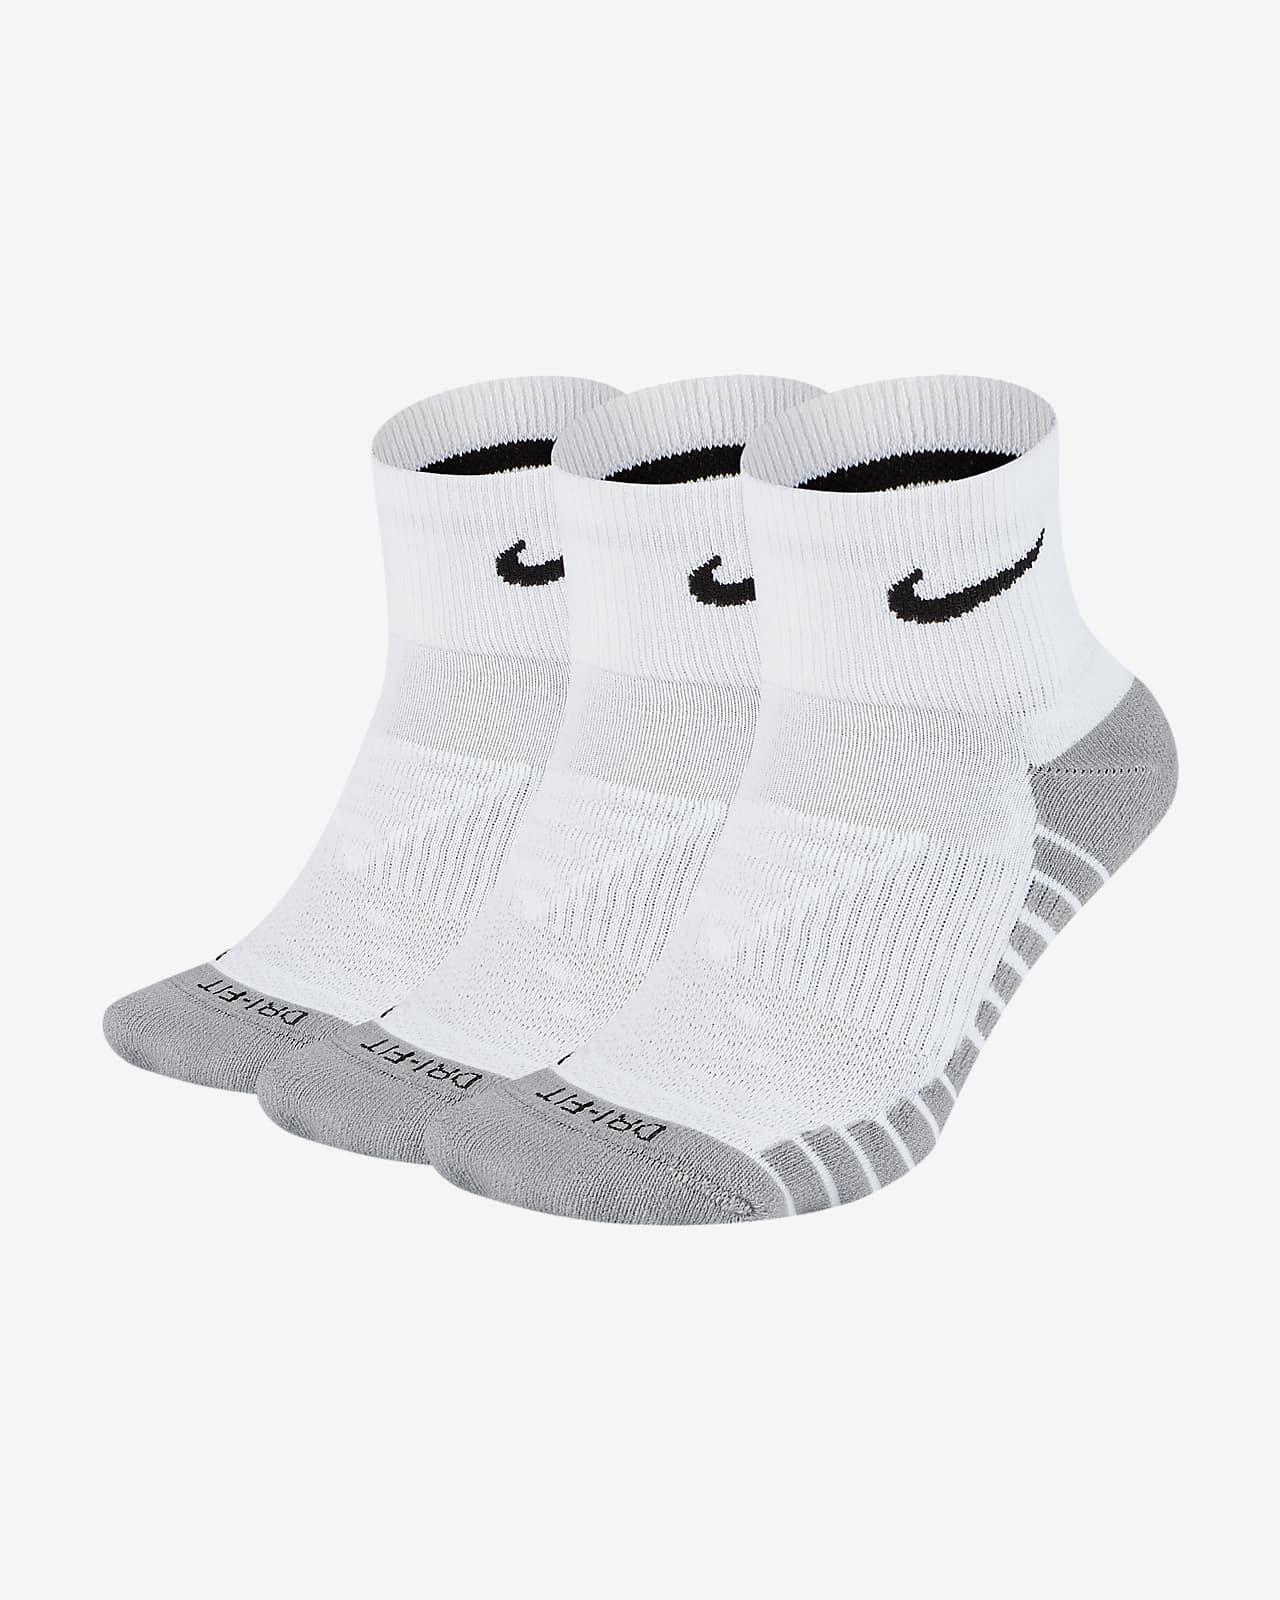 Nike Everyday Max Cushioned Training Ankle Socks (3 Pairs)